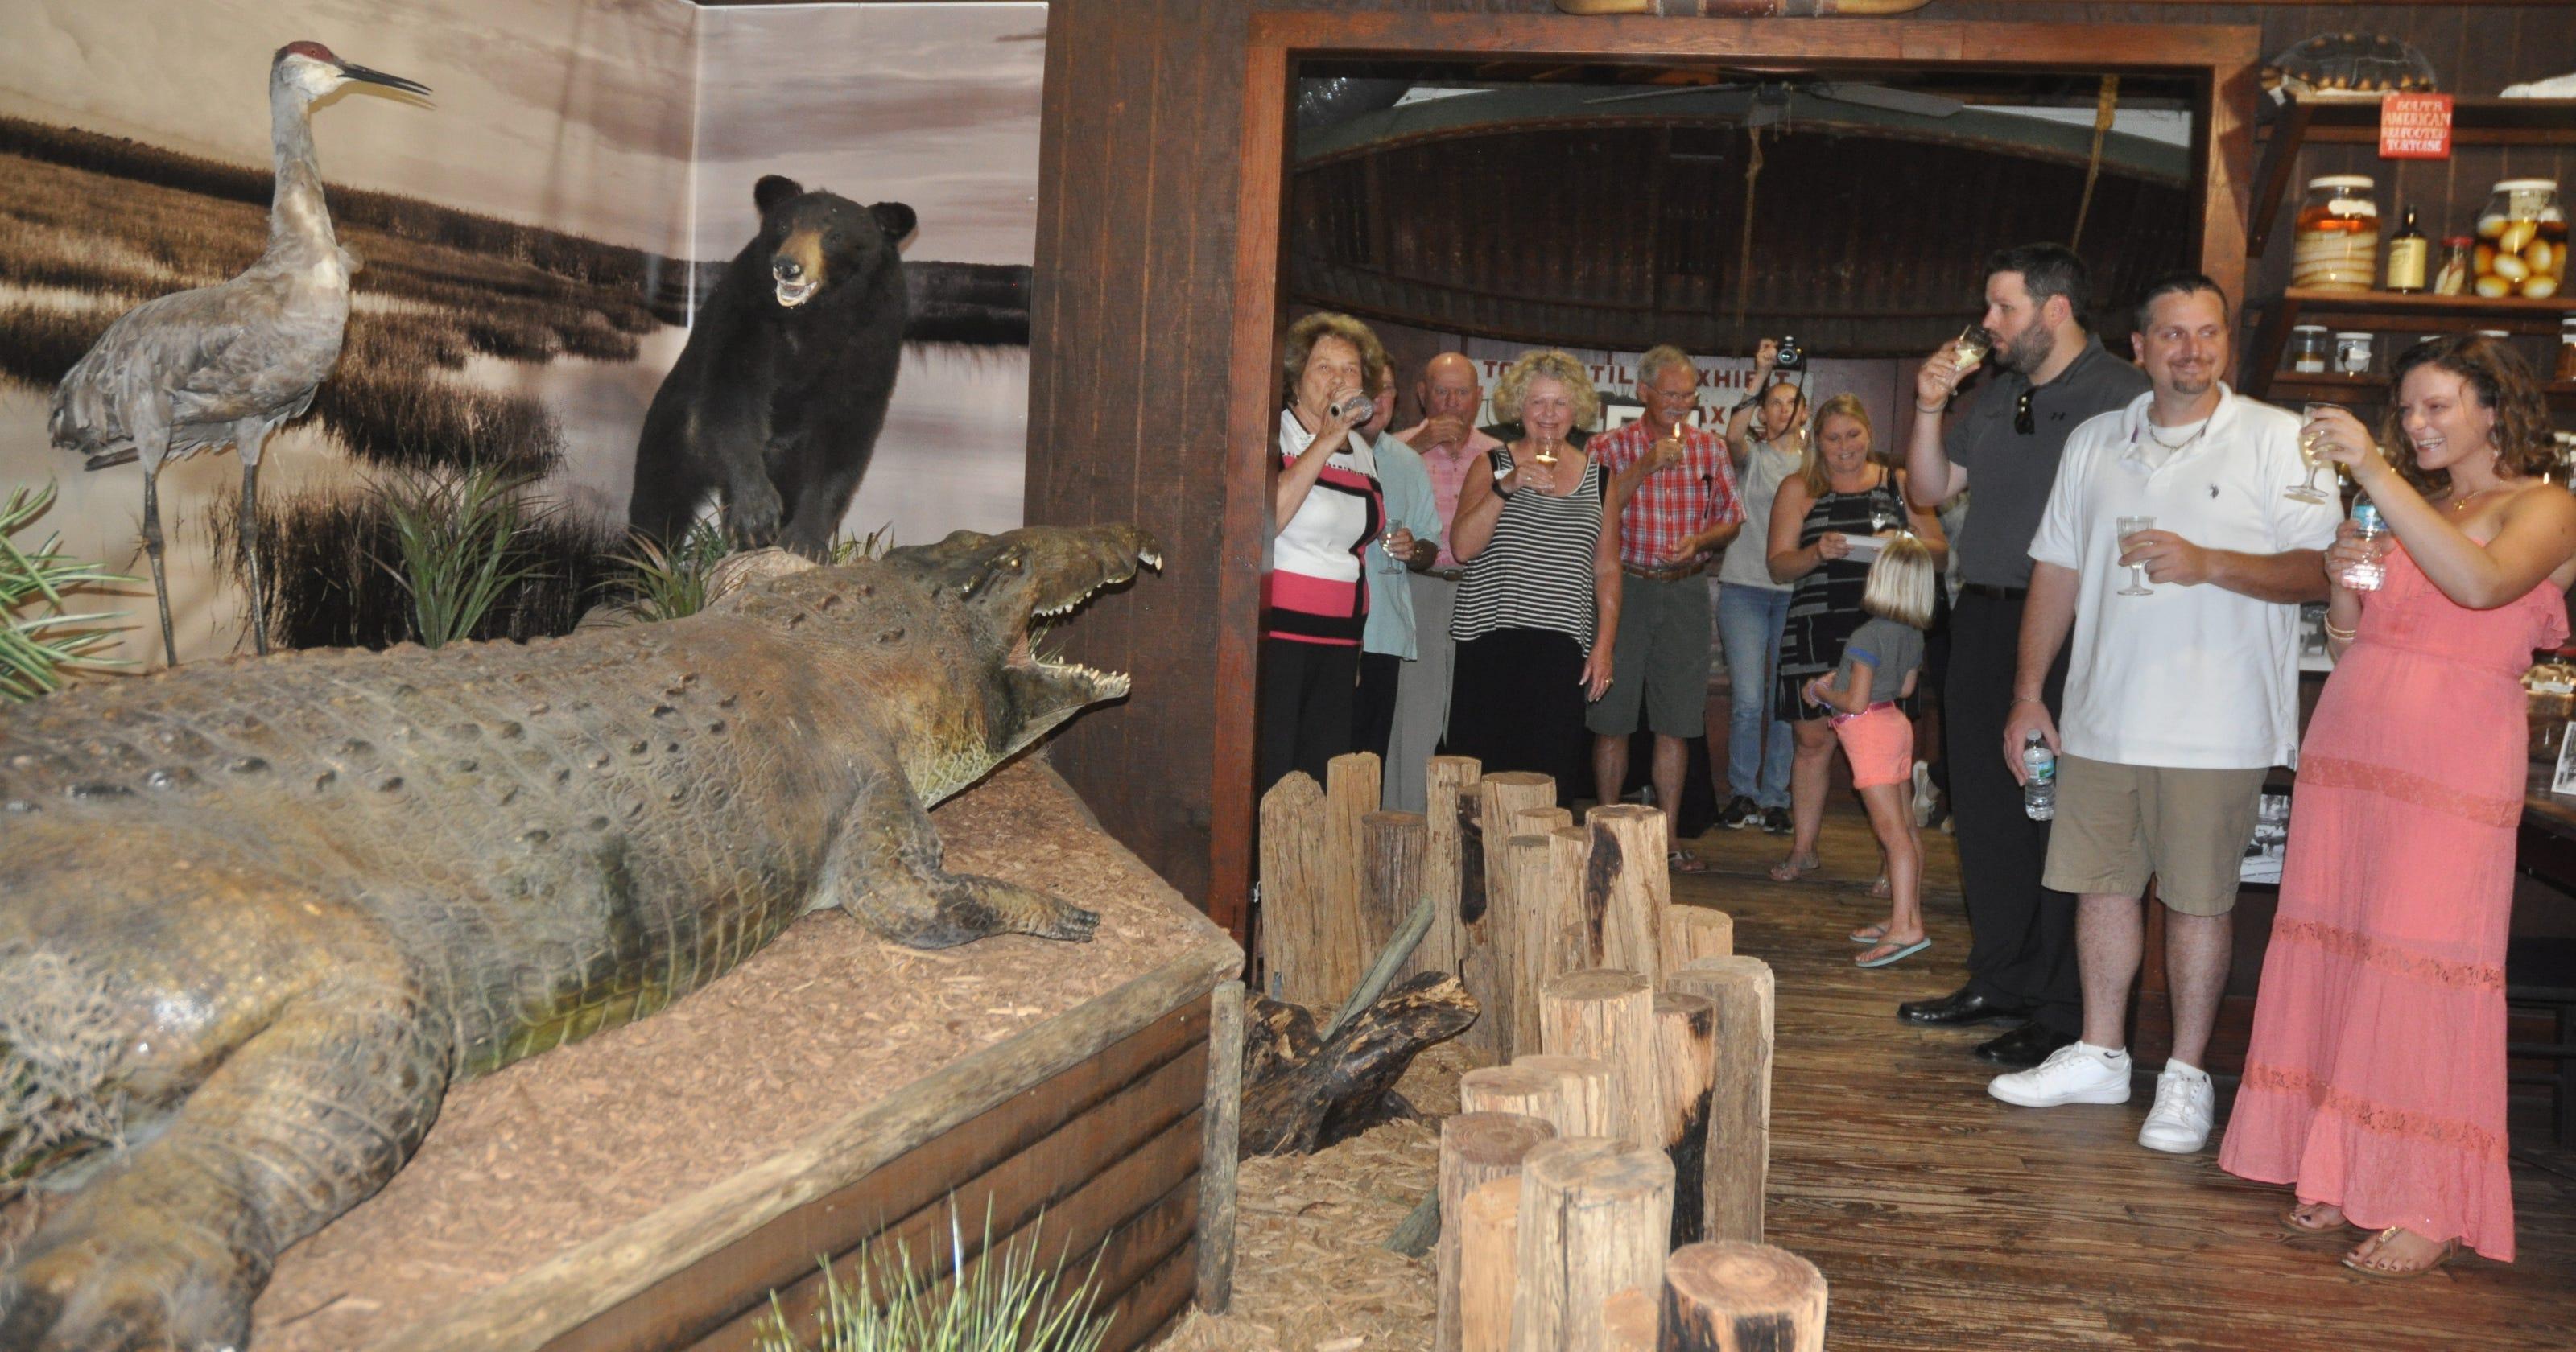 Big Joe, the giant crocodile, returns to Wonder Gardens